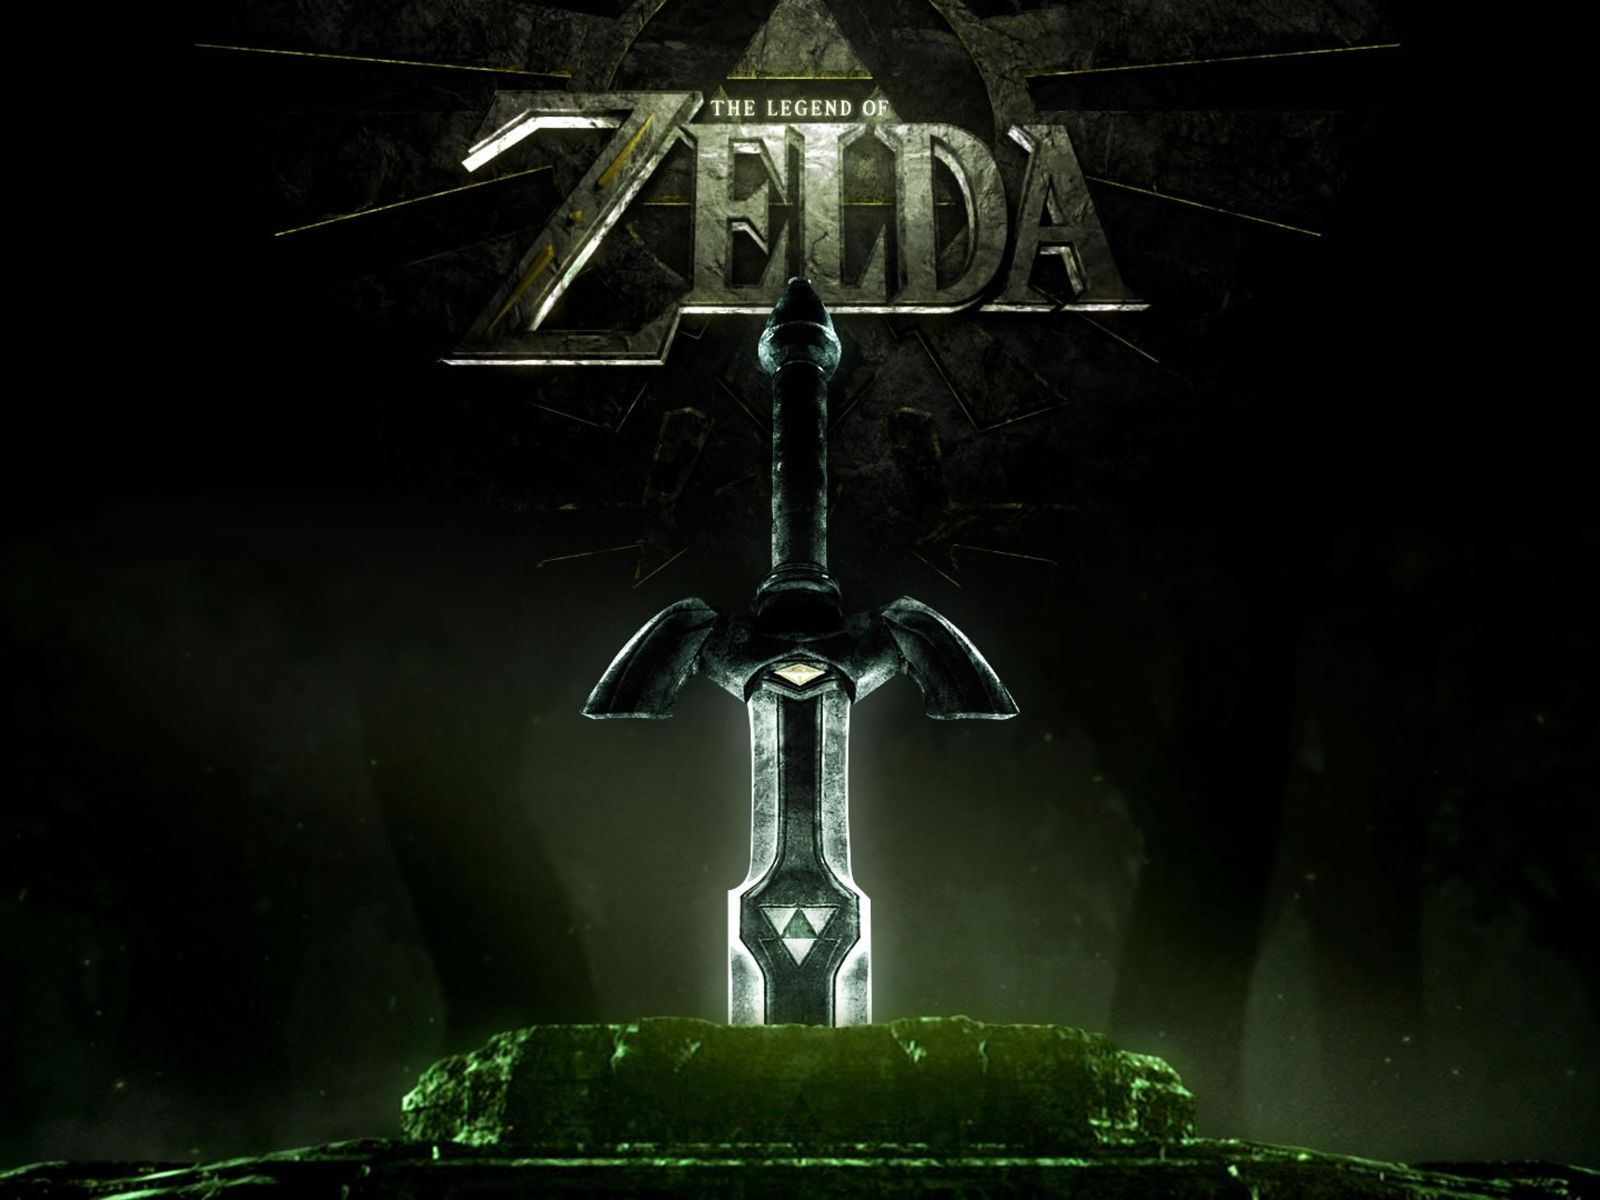 The Legend of Zelda 1600x1200 4k HD wallpaper wallpprscom 1600x1200